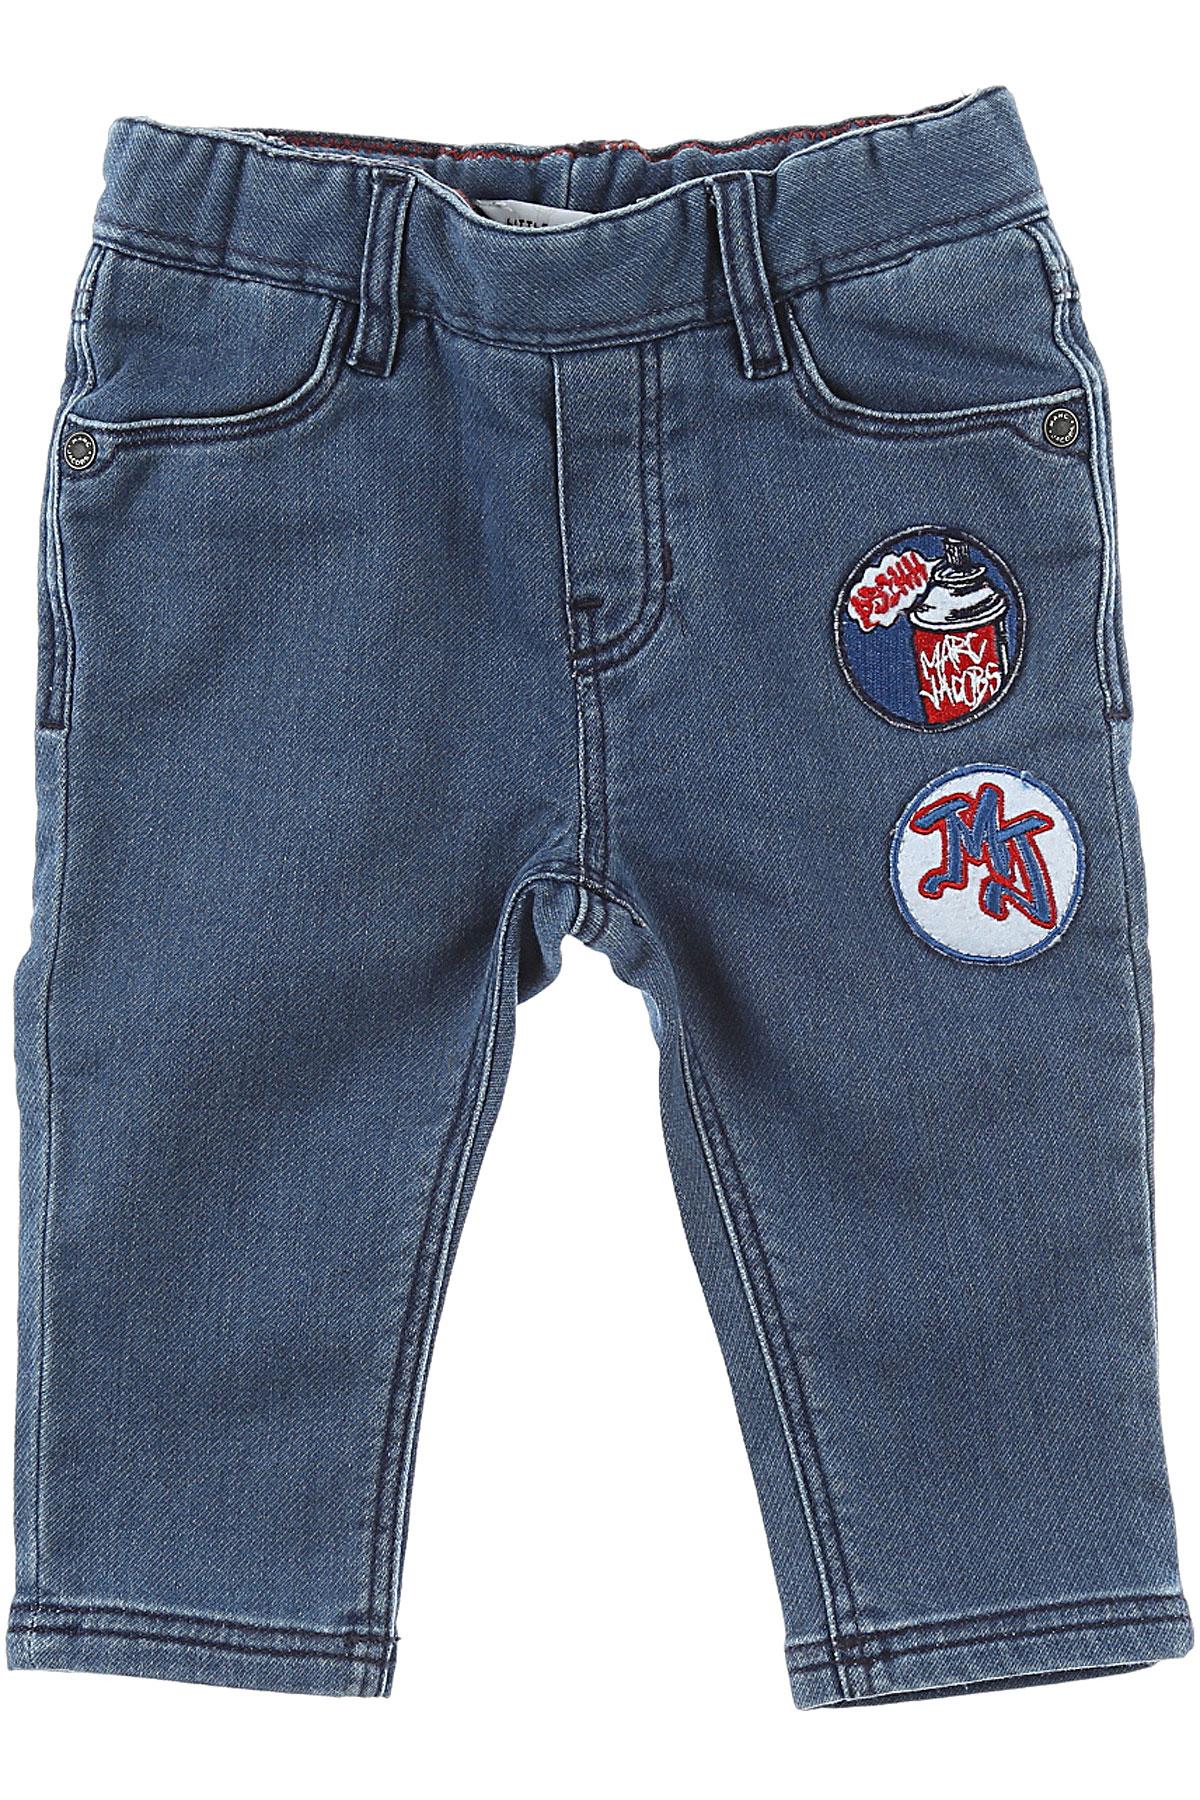 Image of Marc Jacobs Baby Jeans for Boys, Blue Denim, Cotton, 2017, 12M 18M 2Y 3Y 6M 9M